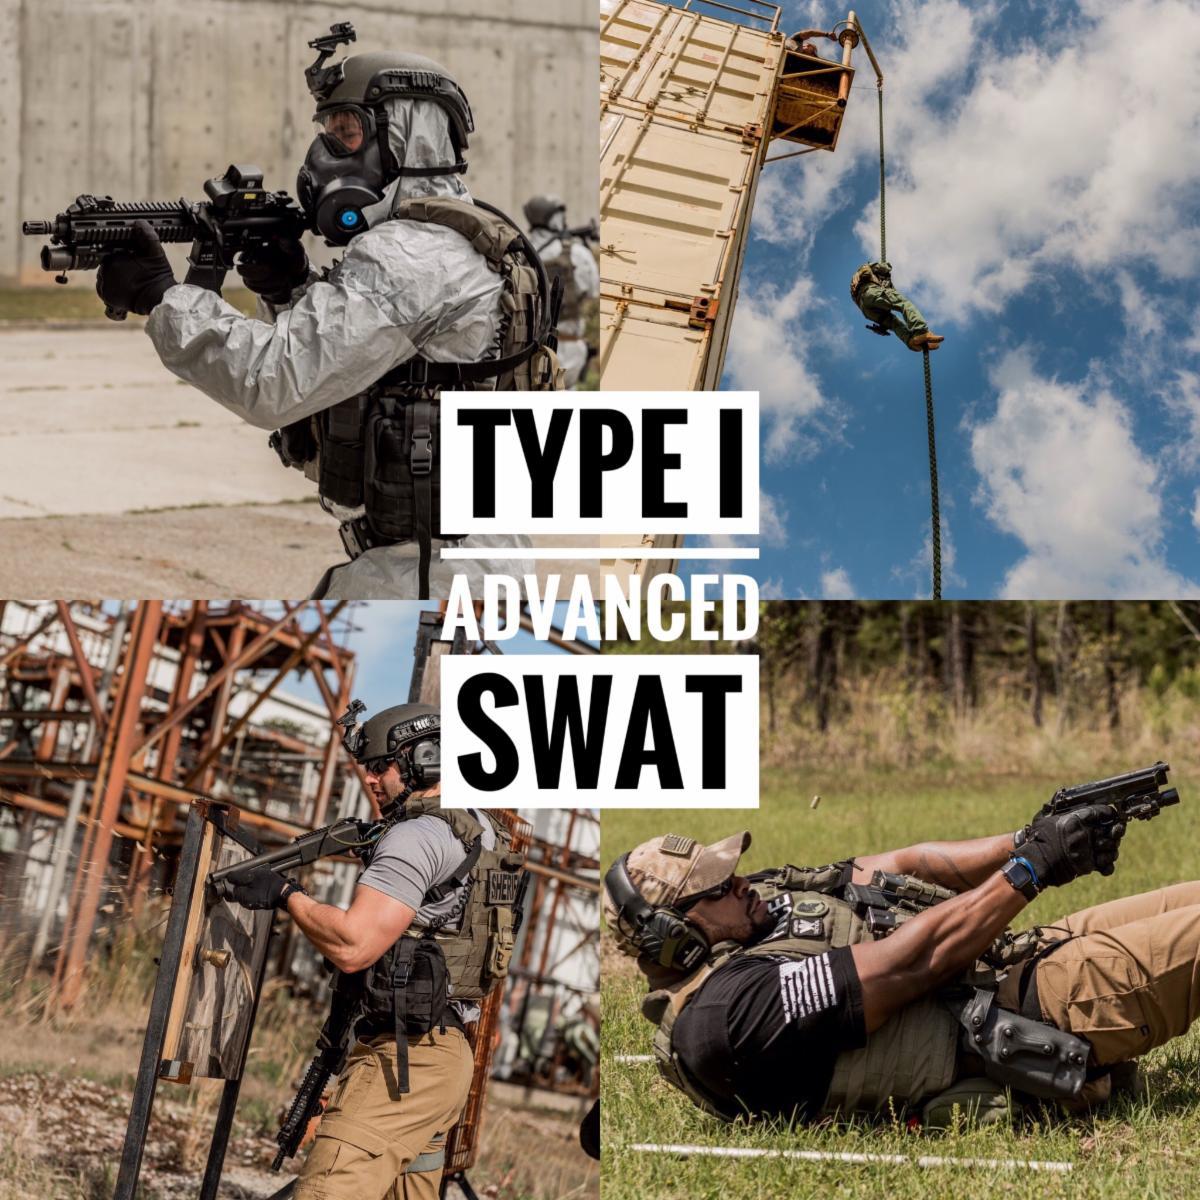 Type I Advanced SWAT